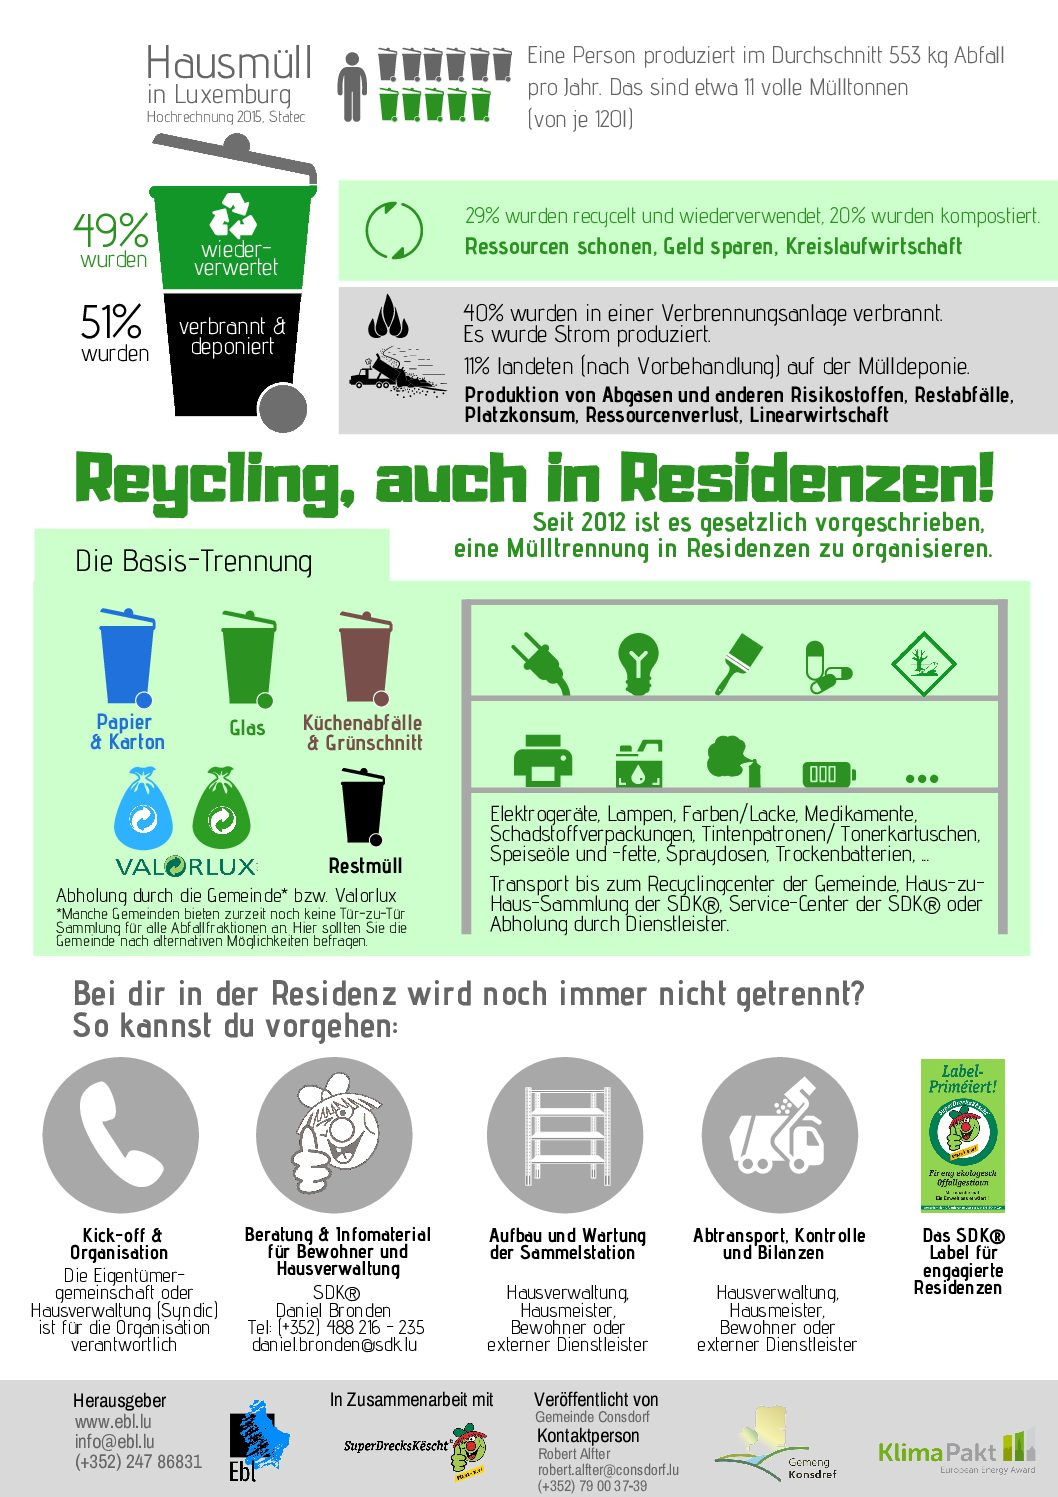 Recycling, och a Residenzen!